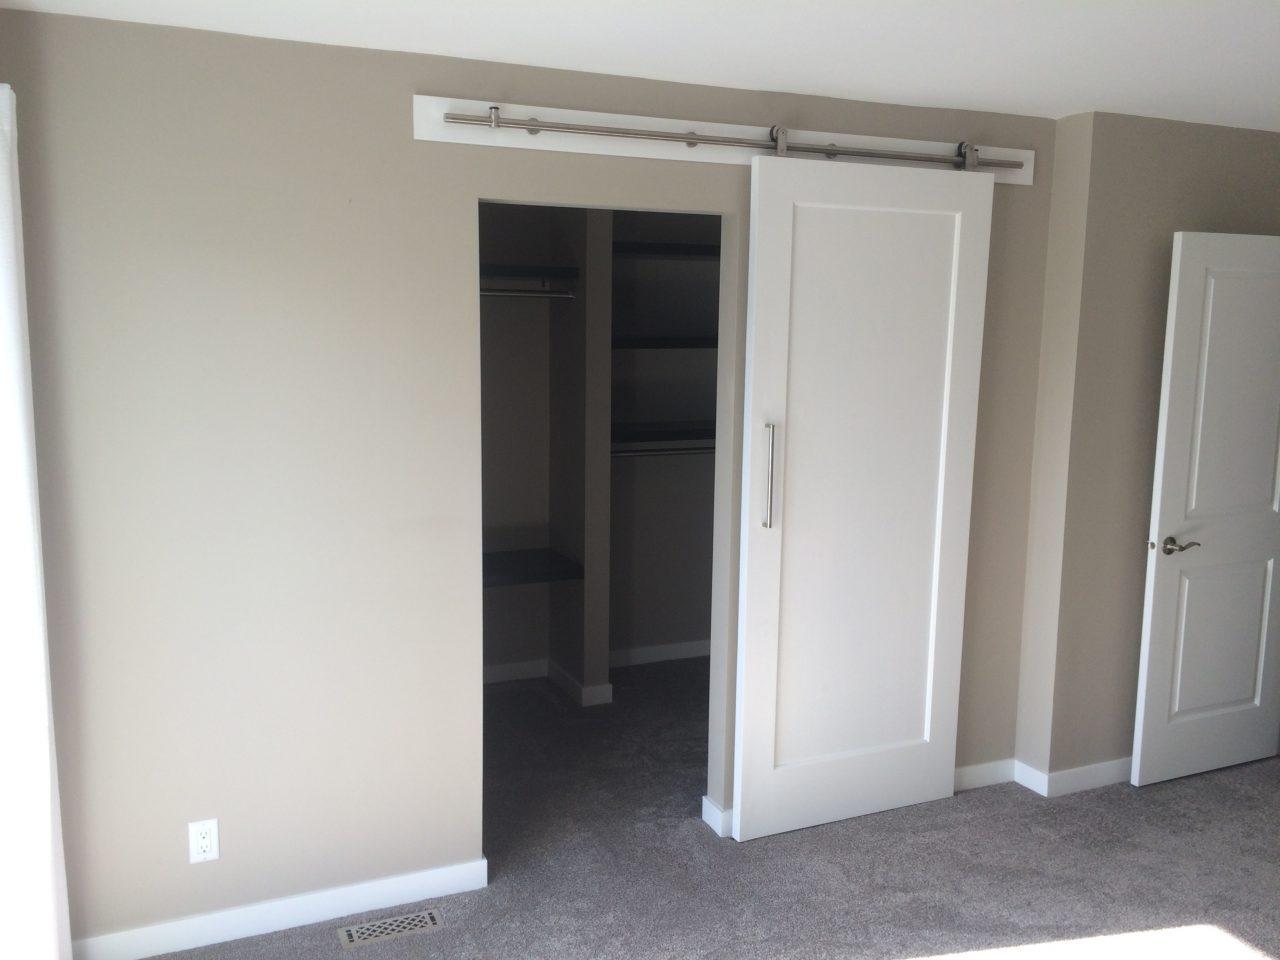 walk-in-closet-construction